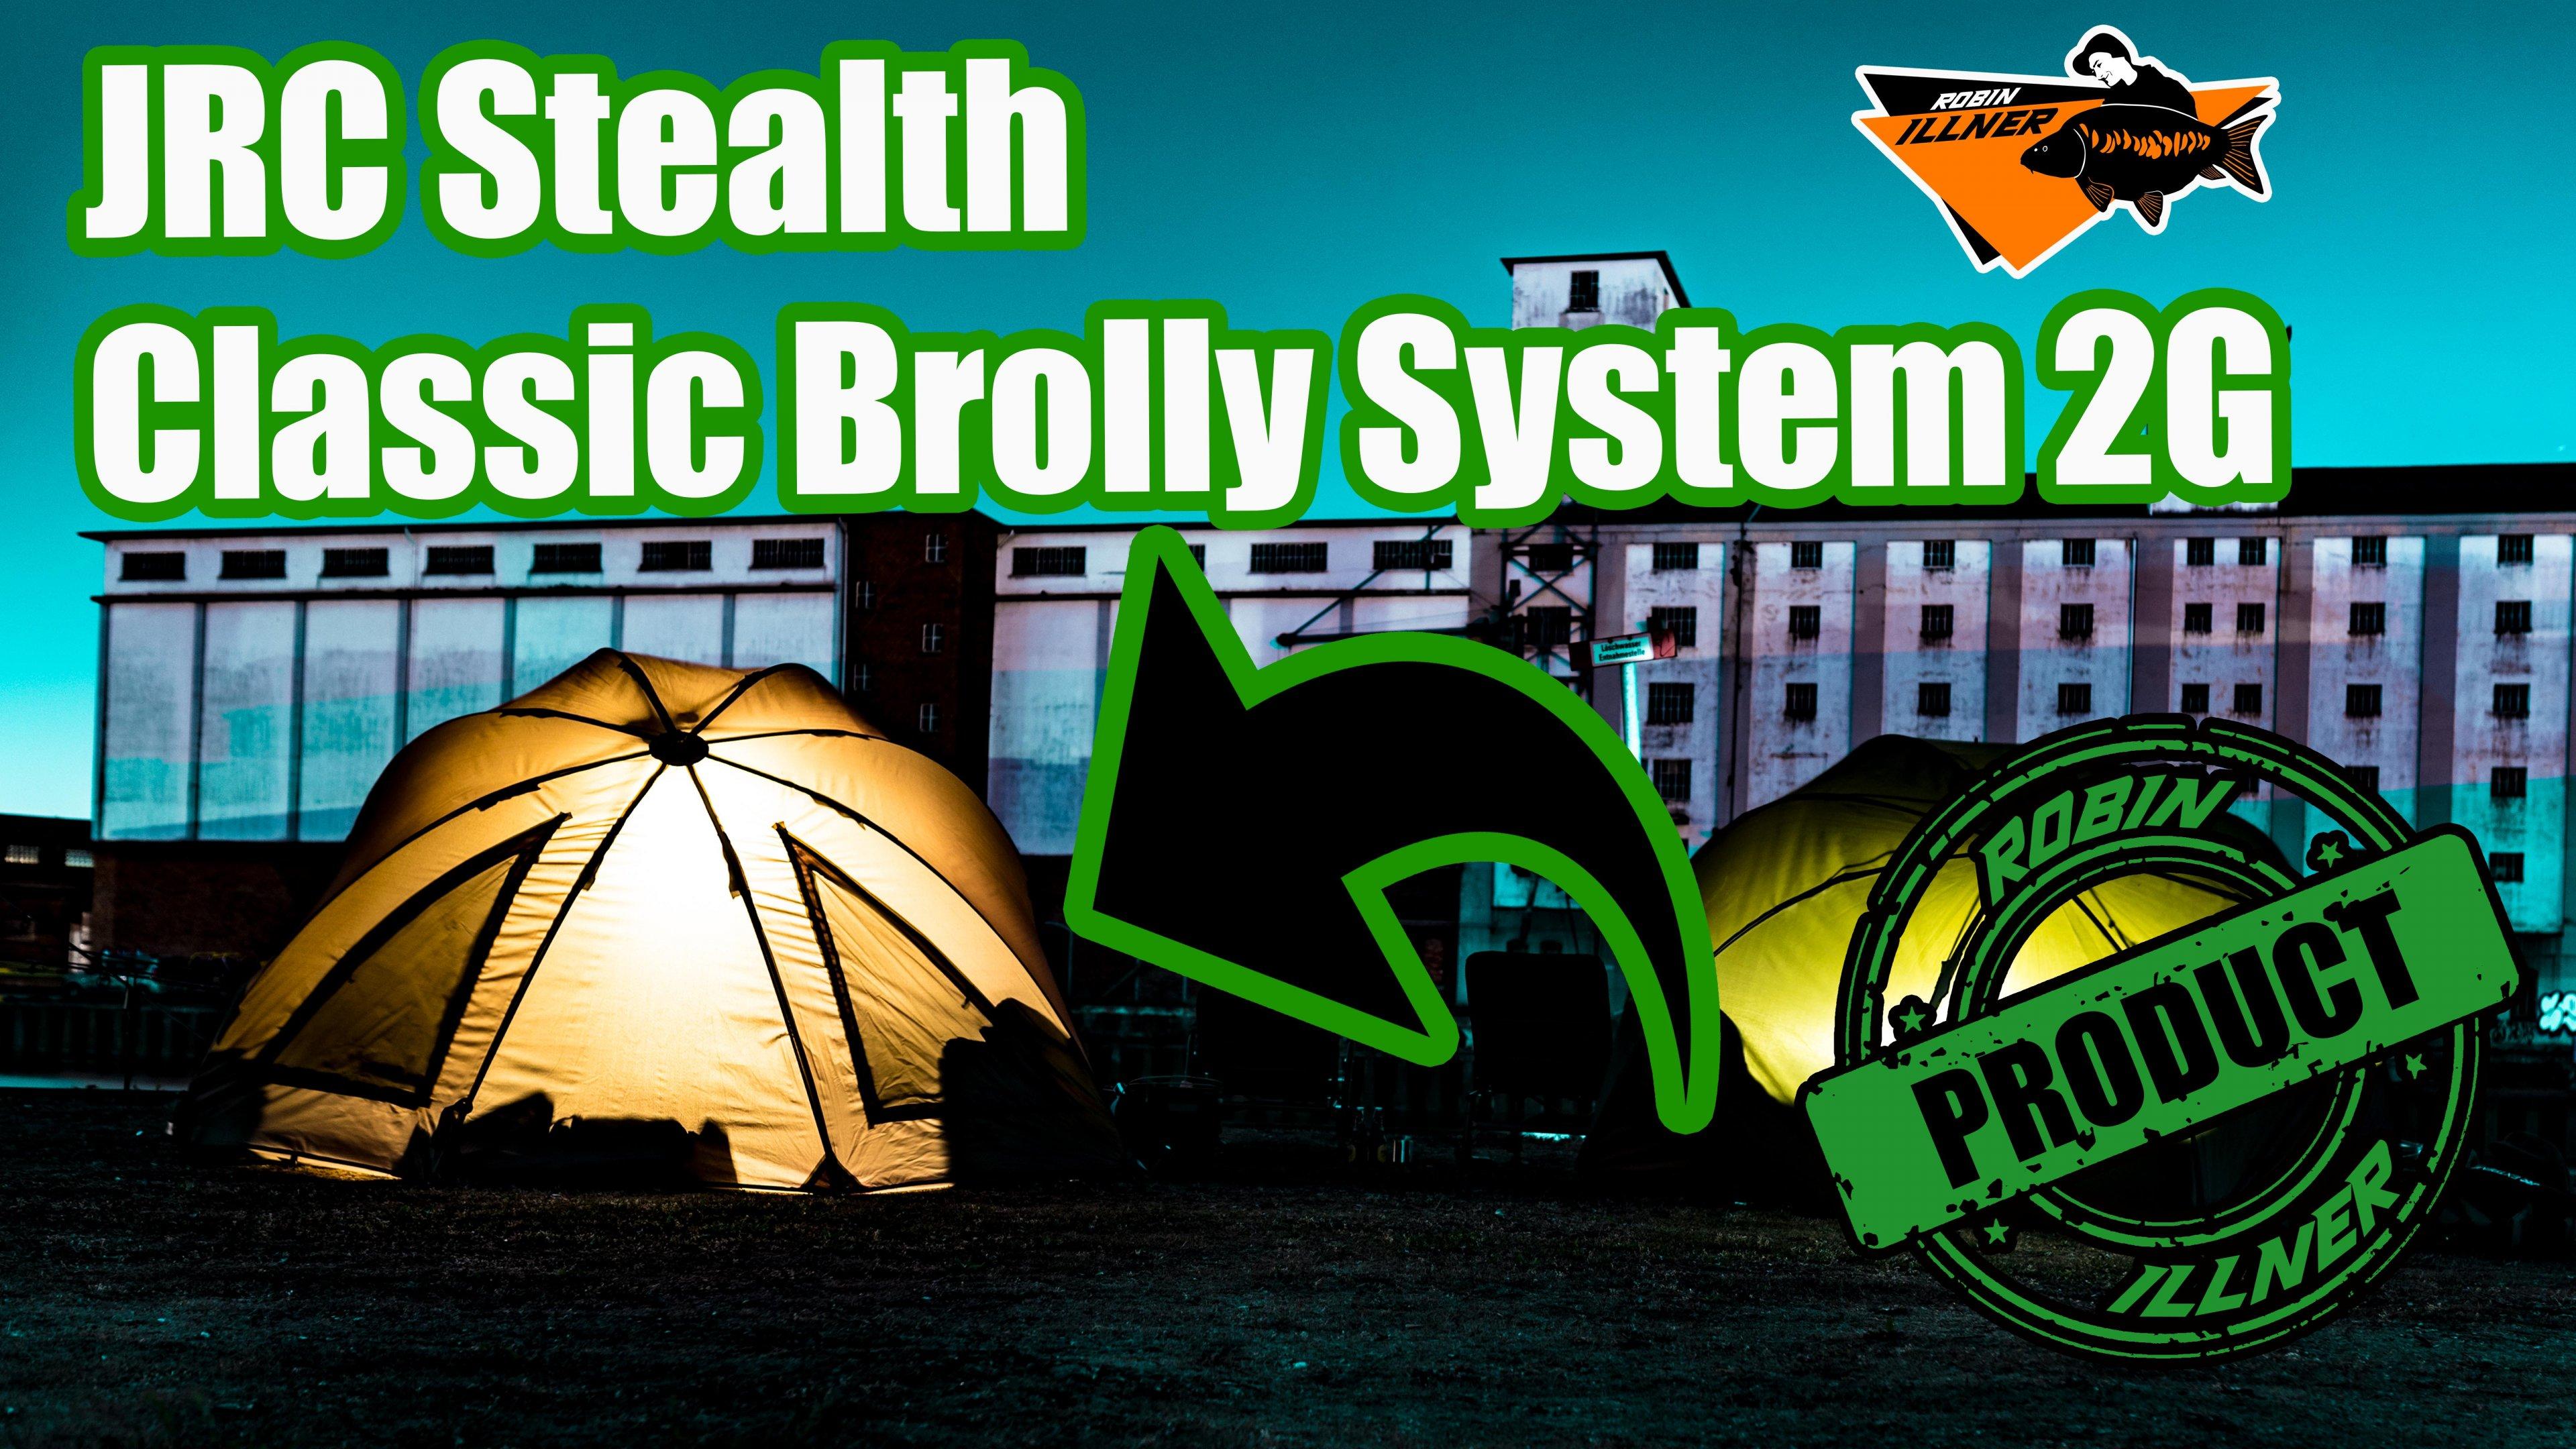 JRC Stealth Classic Brolly System 2G.jpg